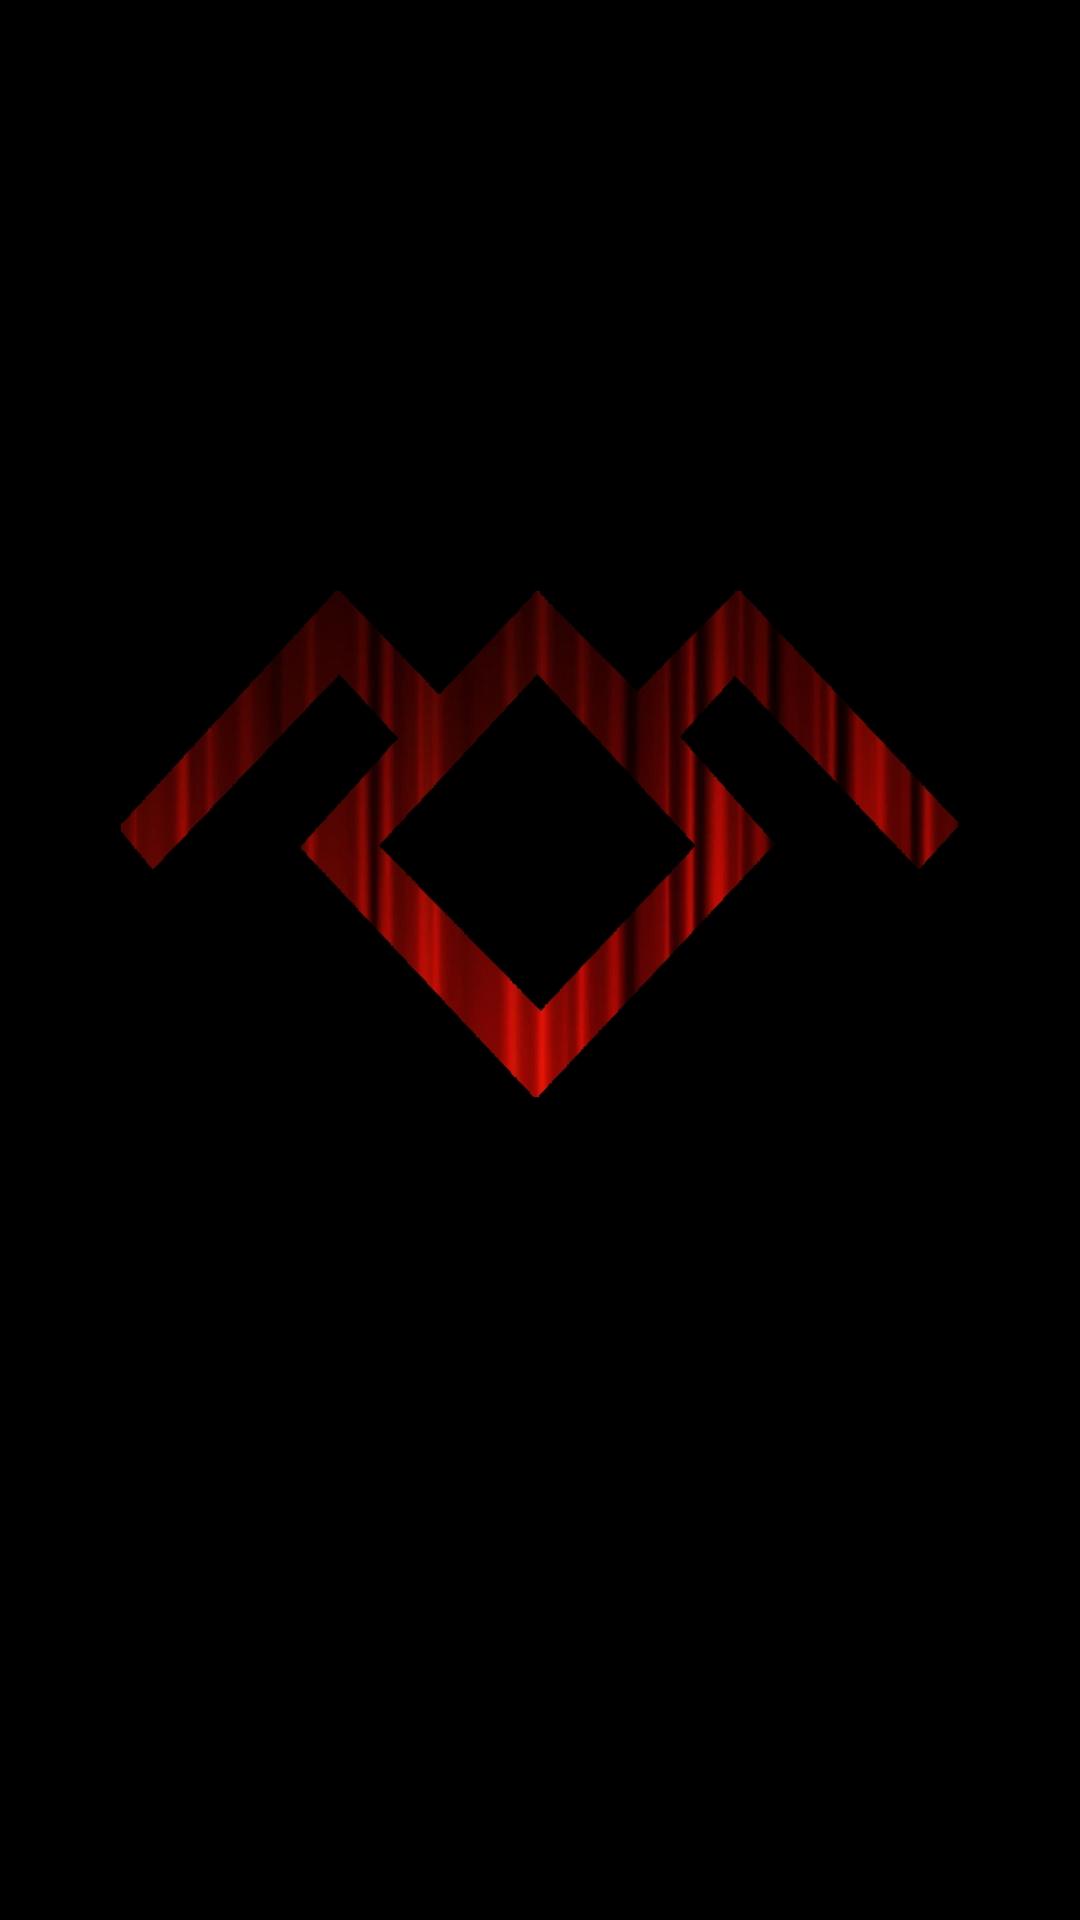 twin peaks [1080x1920] need #iphone #6s #plus #wallpaper